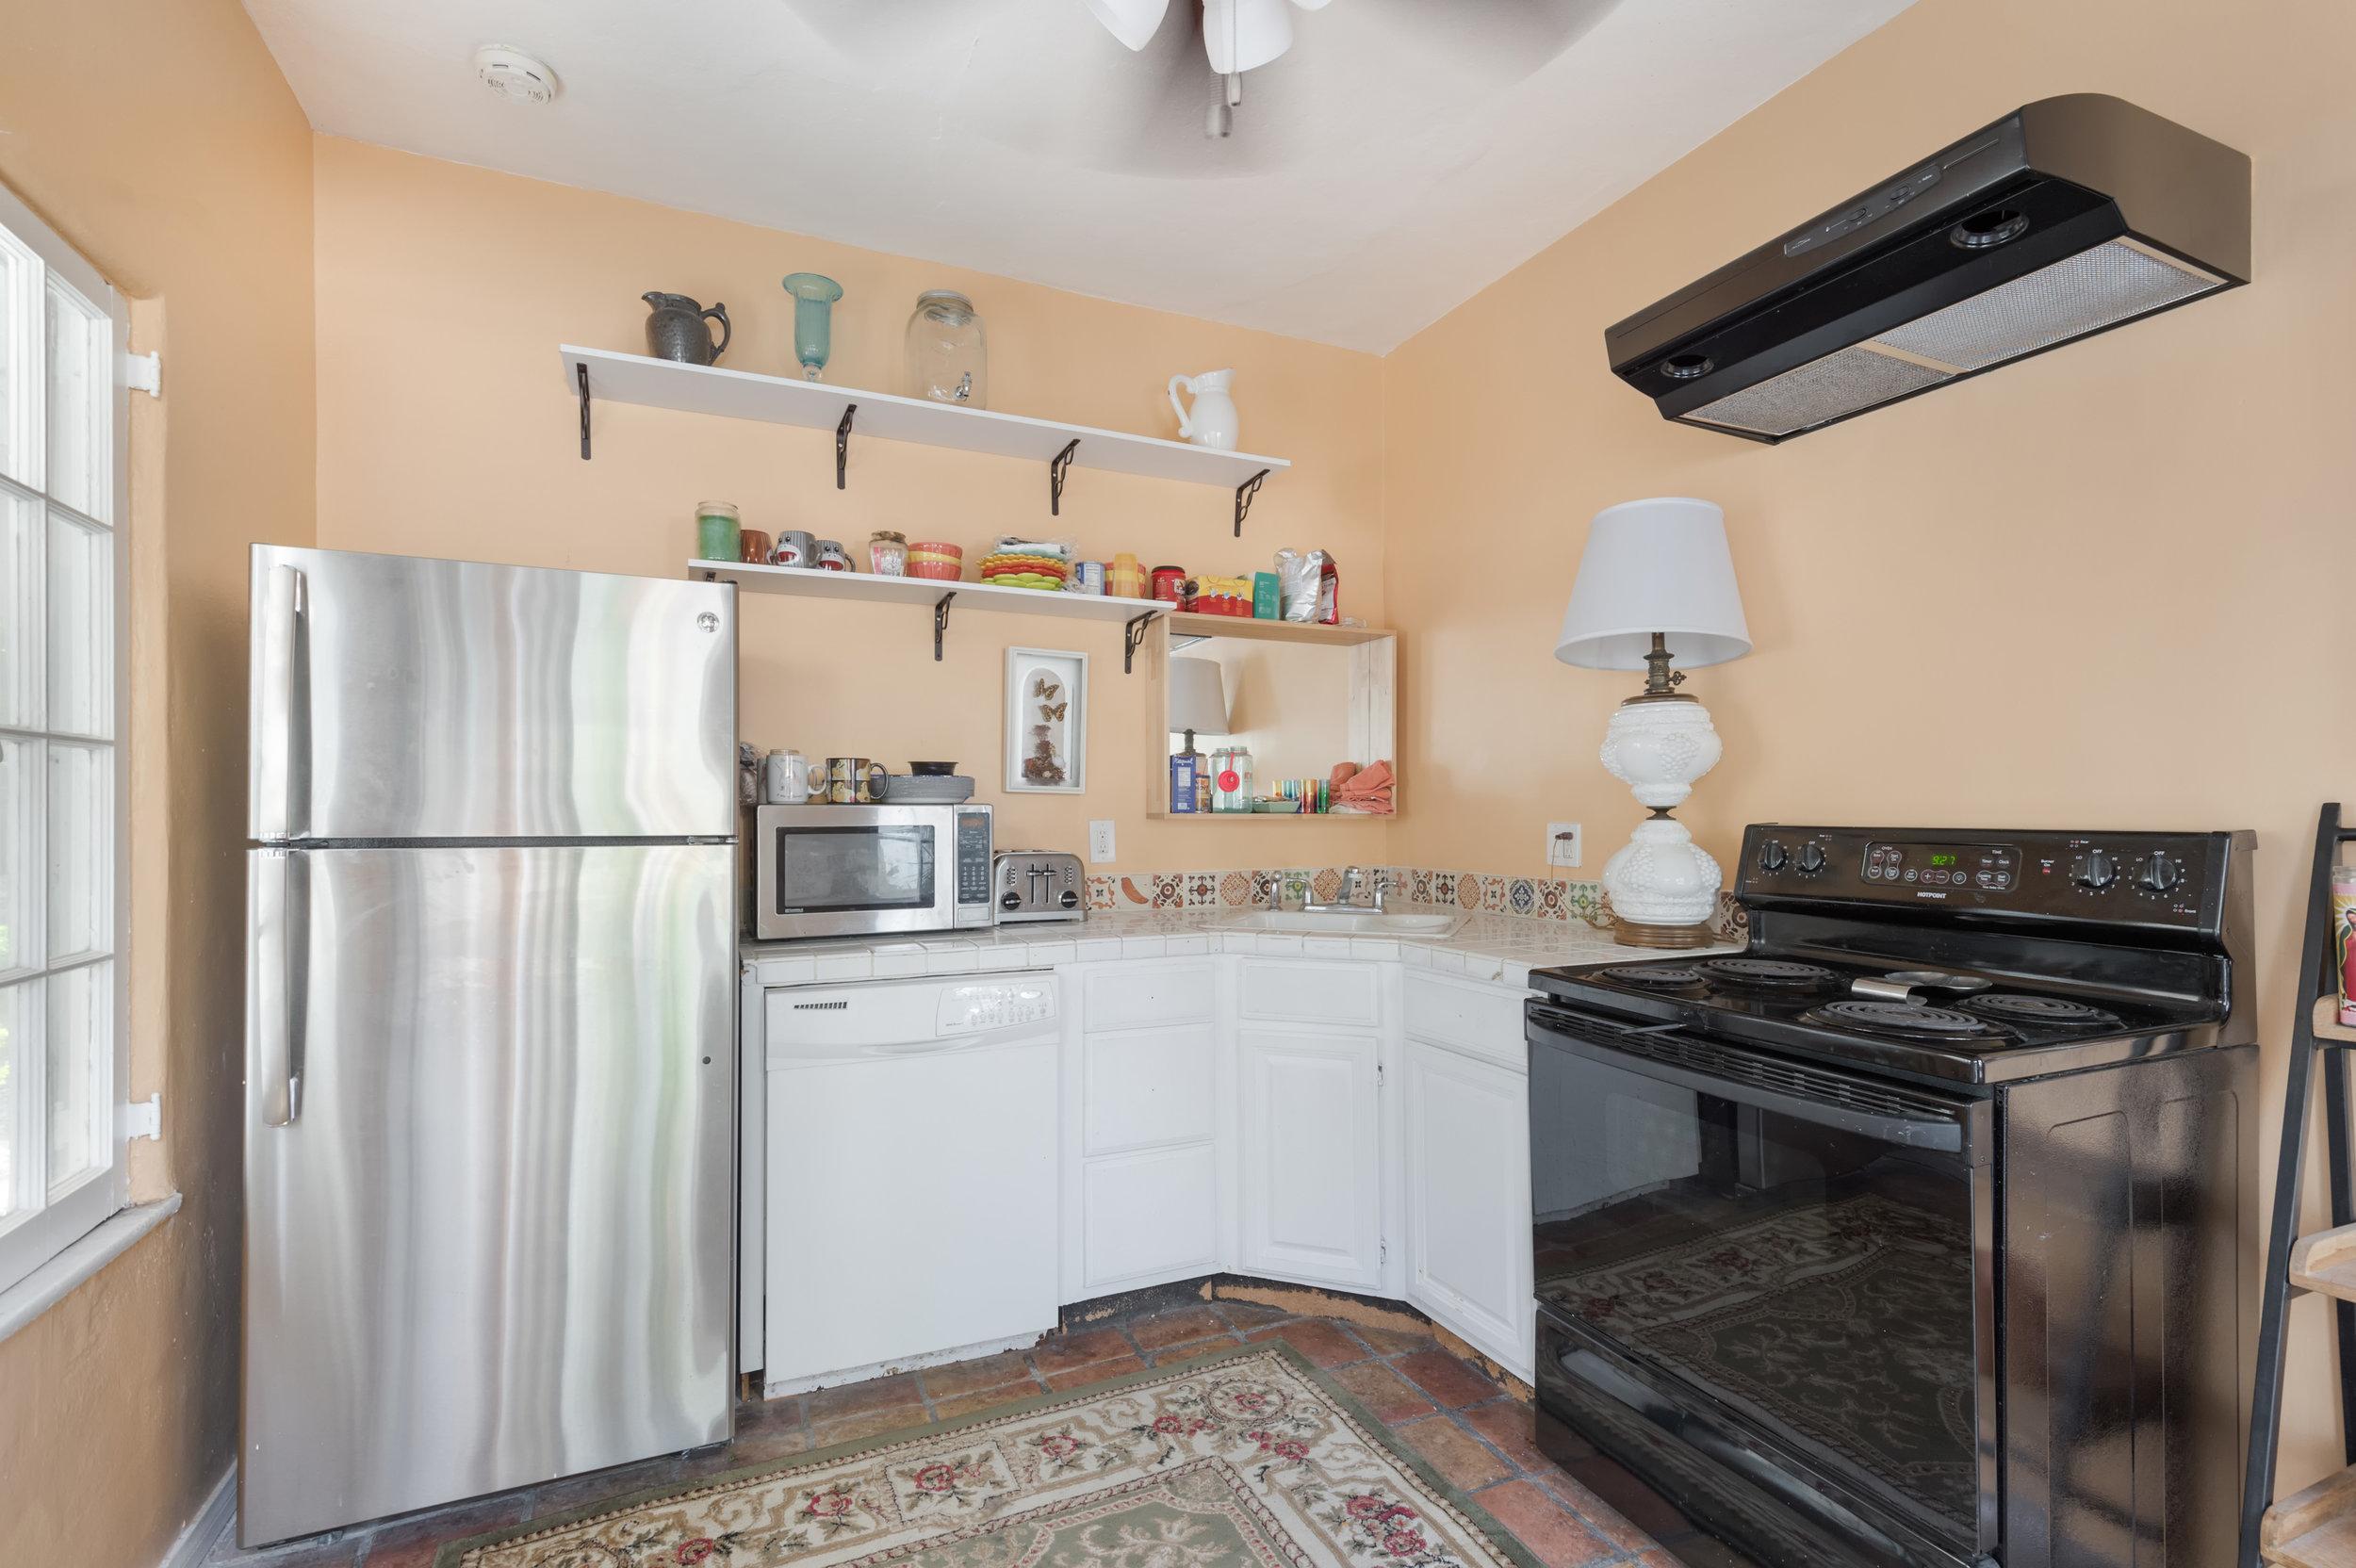 027 Guest House 006 Pool 4915 Los Feliz For Sale Los Angeles Lease The Malibu Life Team Luxury Real Estate.jpg